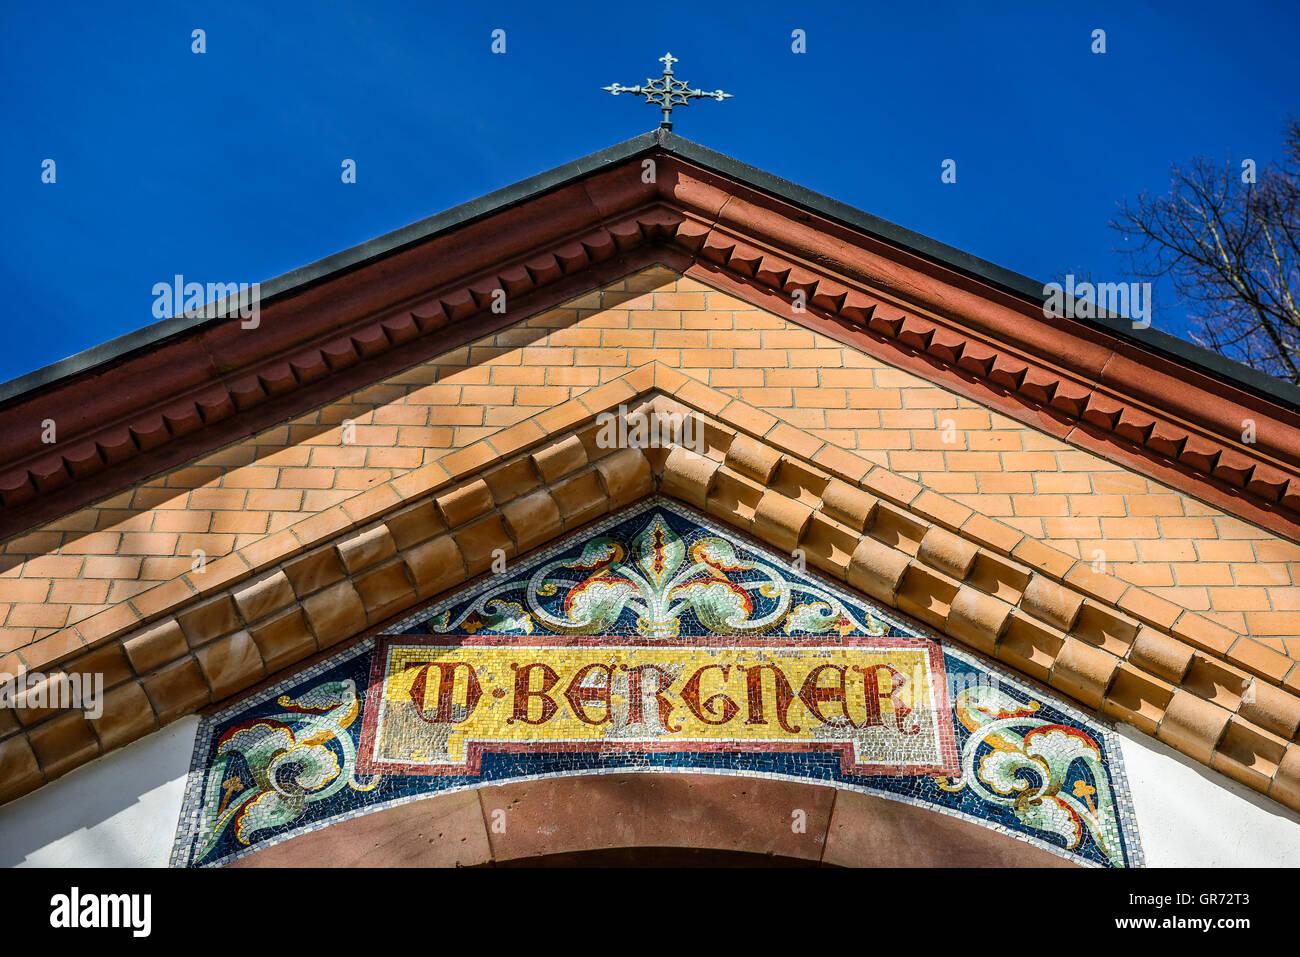 Bergner Mausoleum In Hamburg, Germany - Stock Image